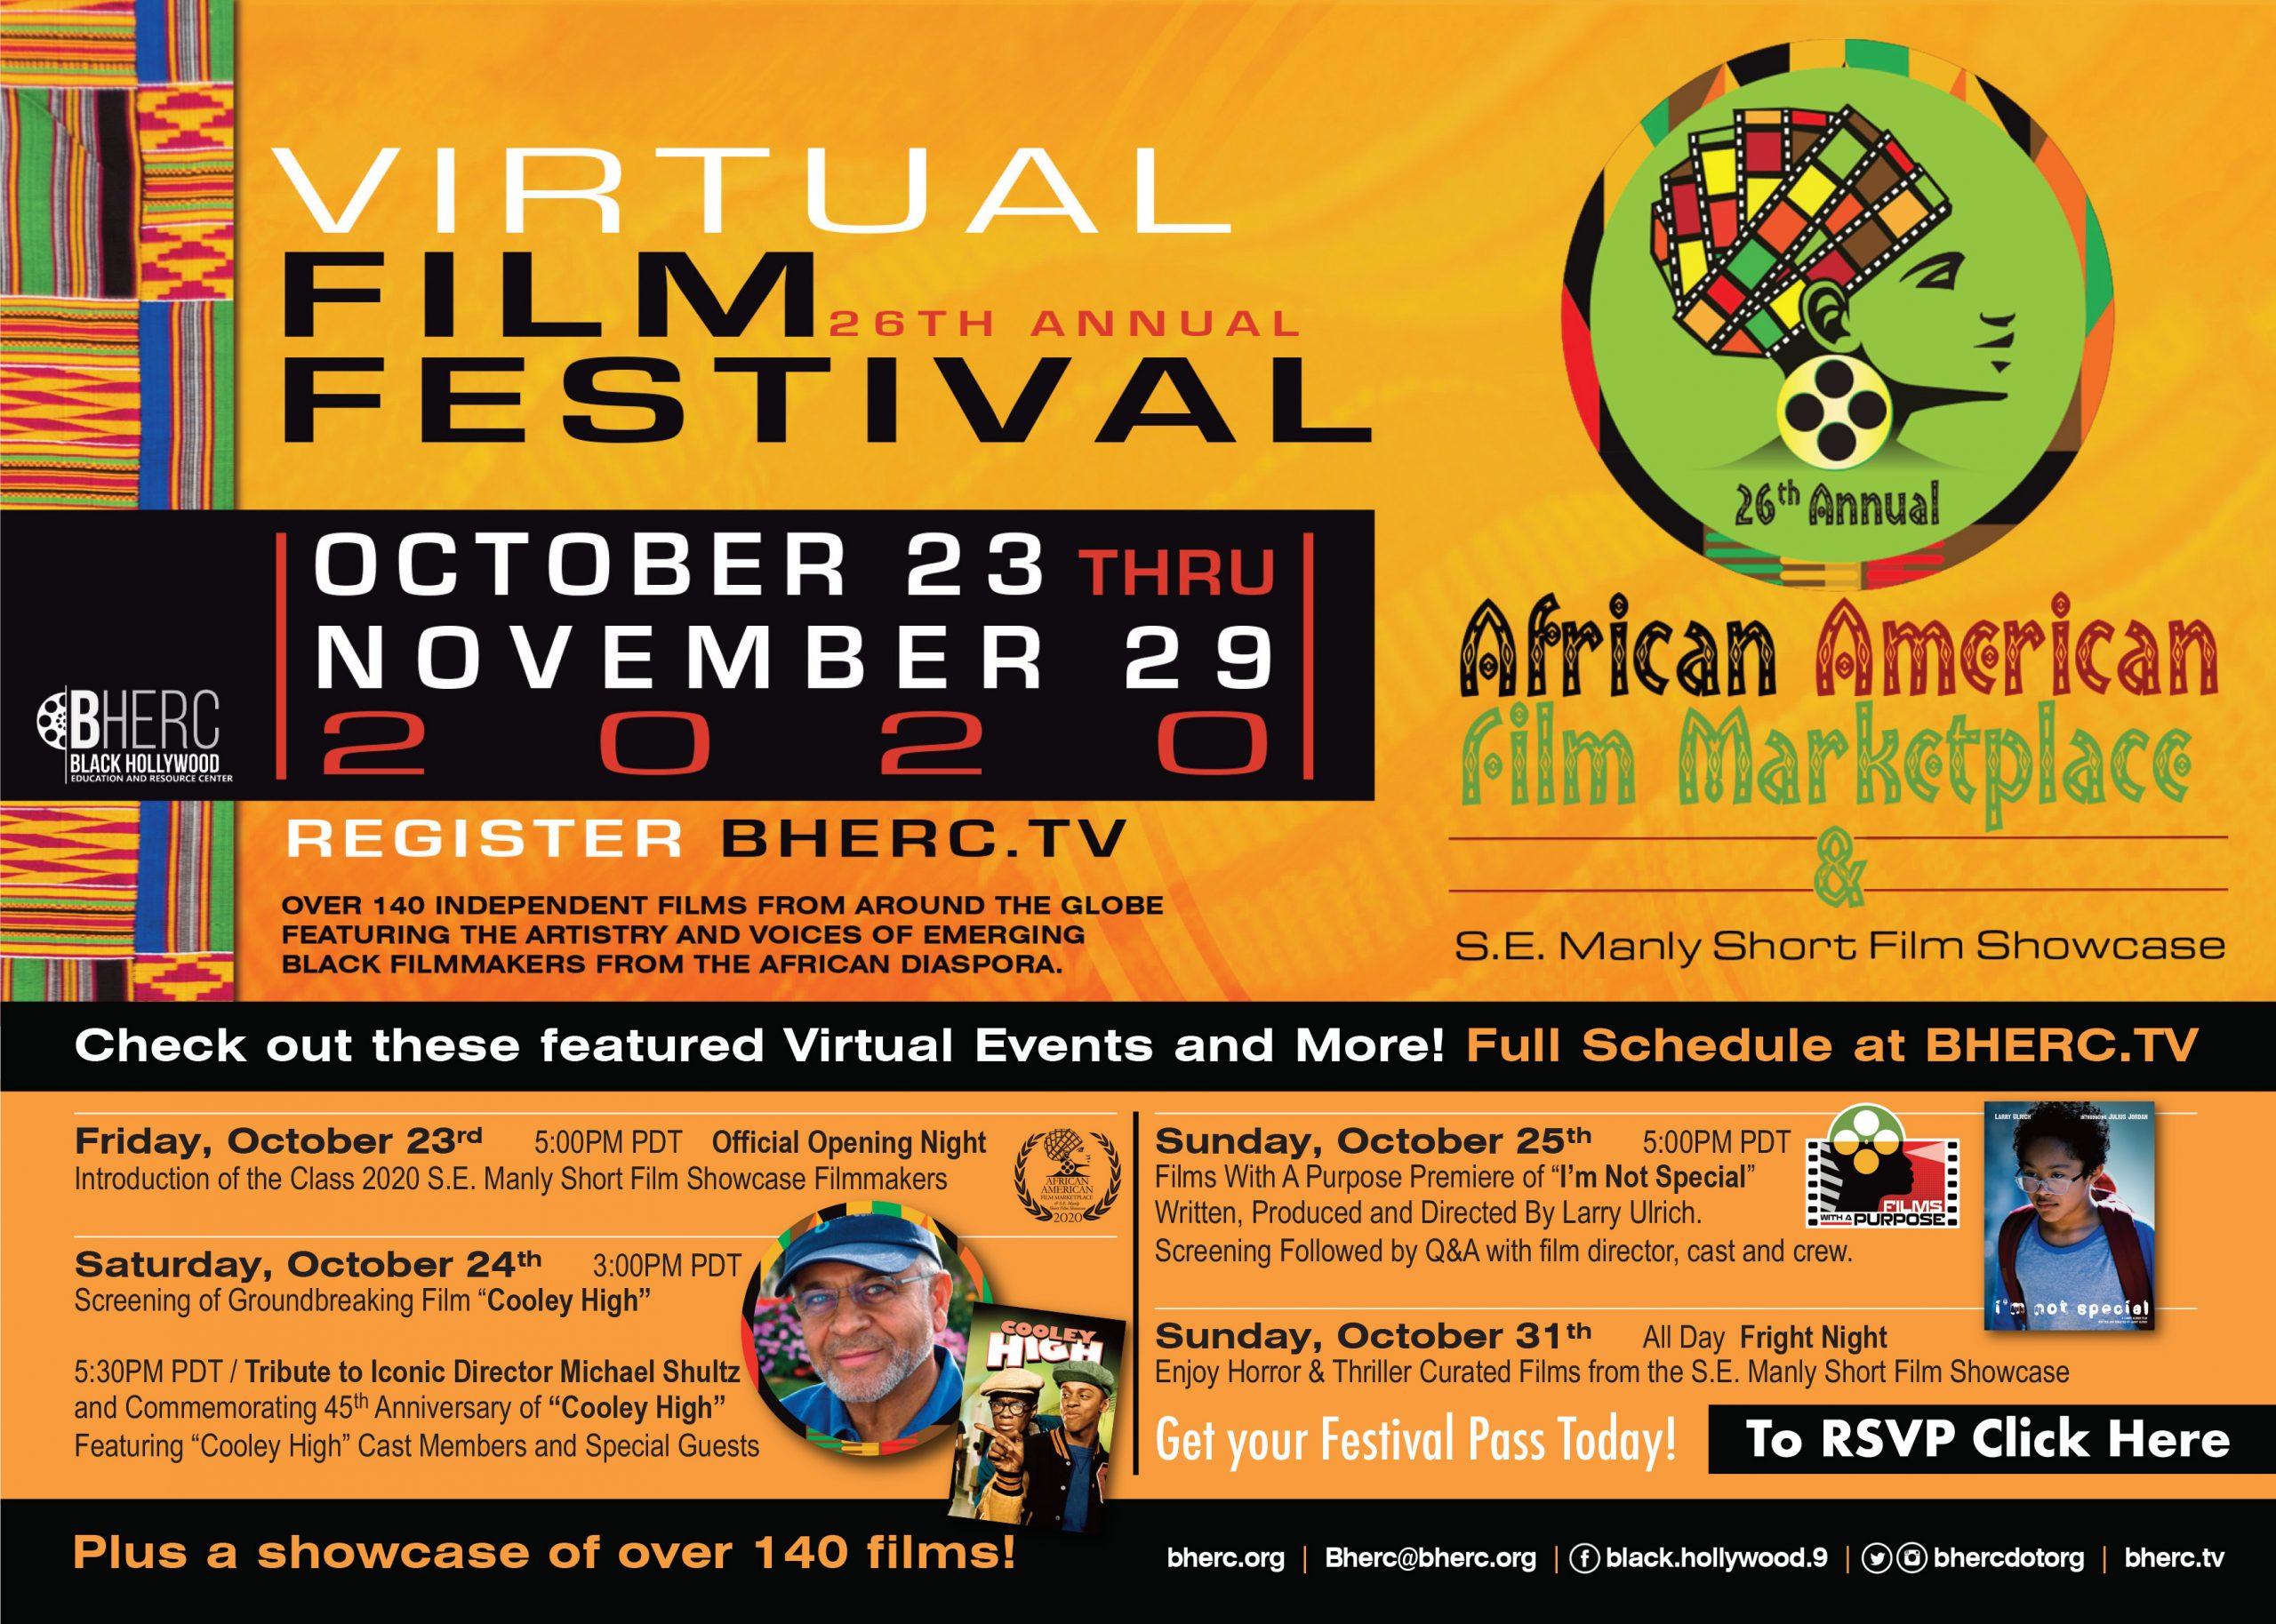 26th Annual AAFM & S. E. Manly Short Film Showcase